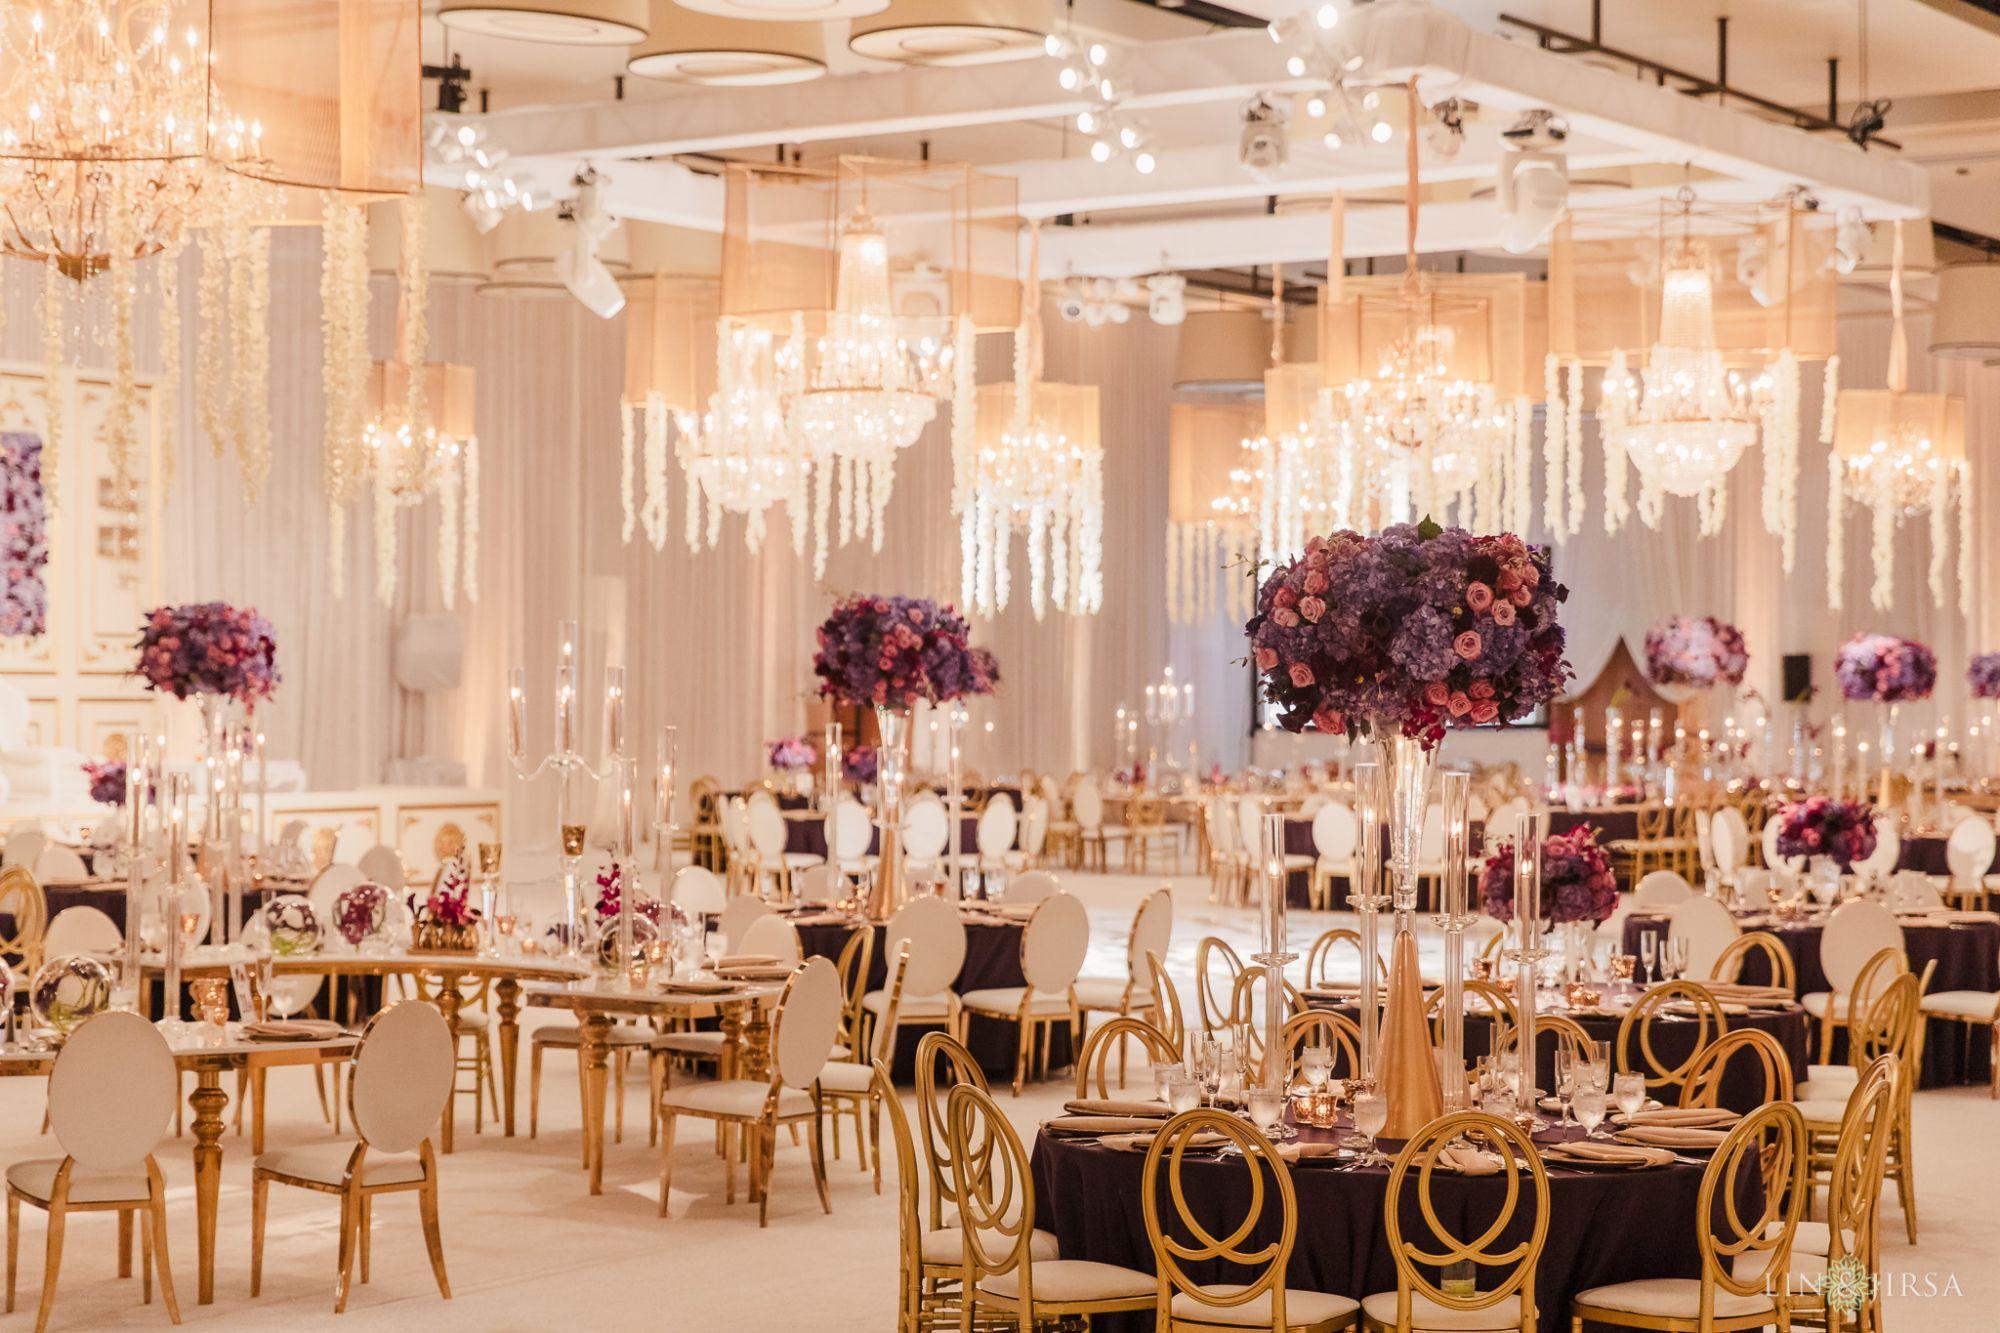 Radhika & Lalit Reception Preview Wedding decorations